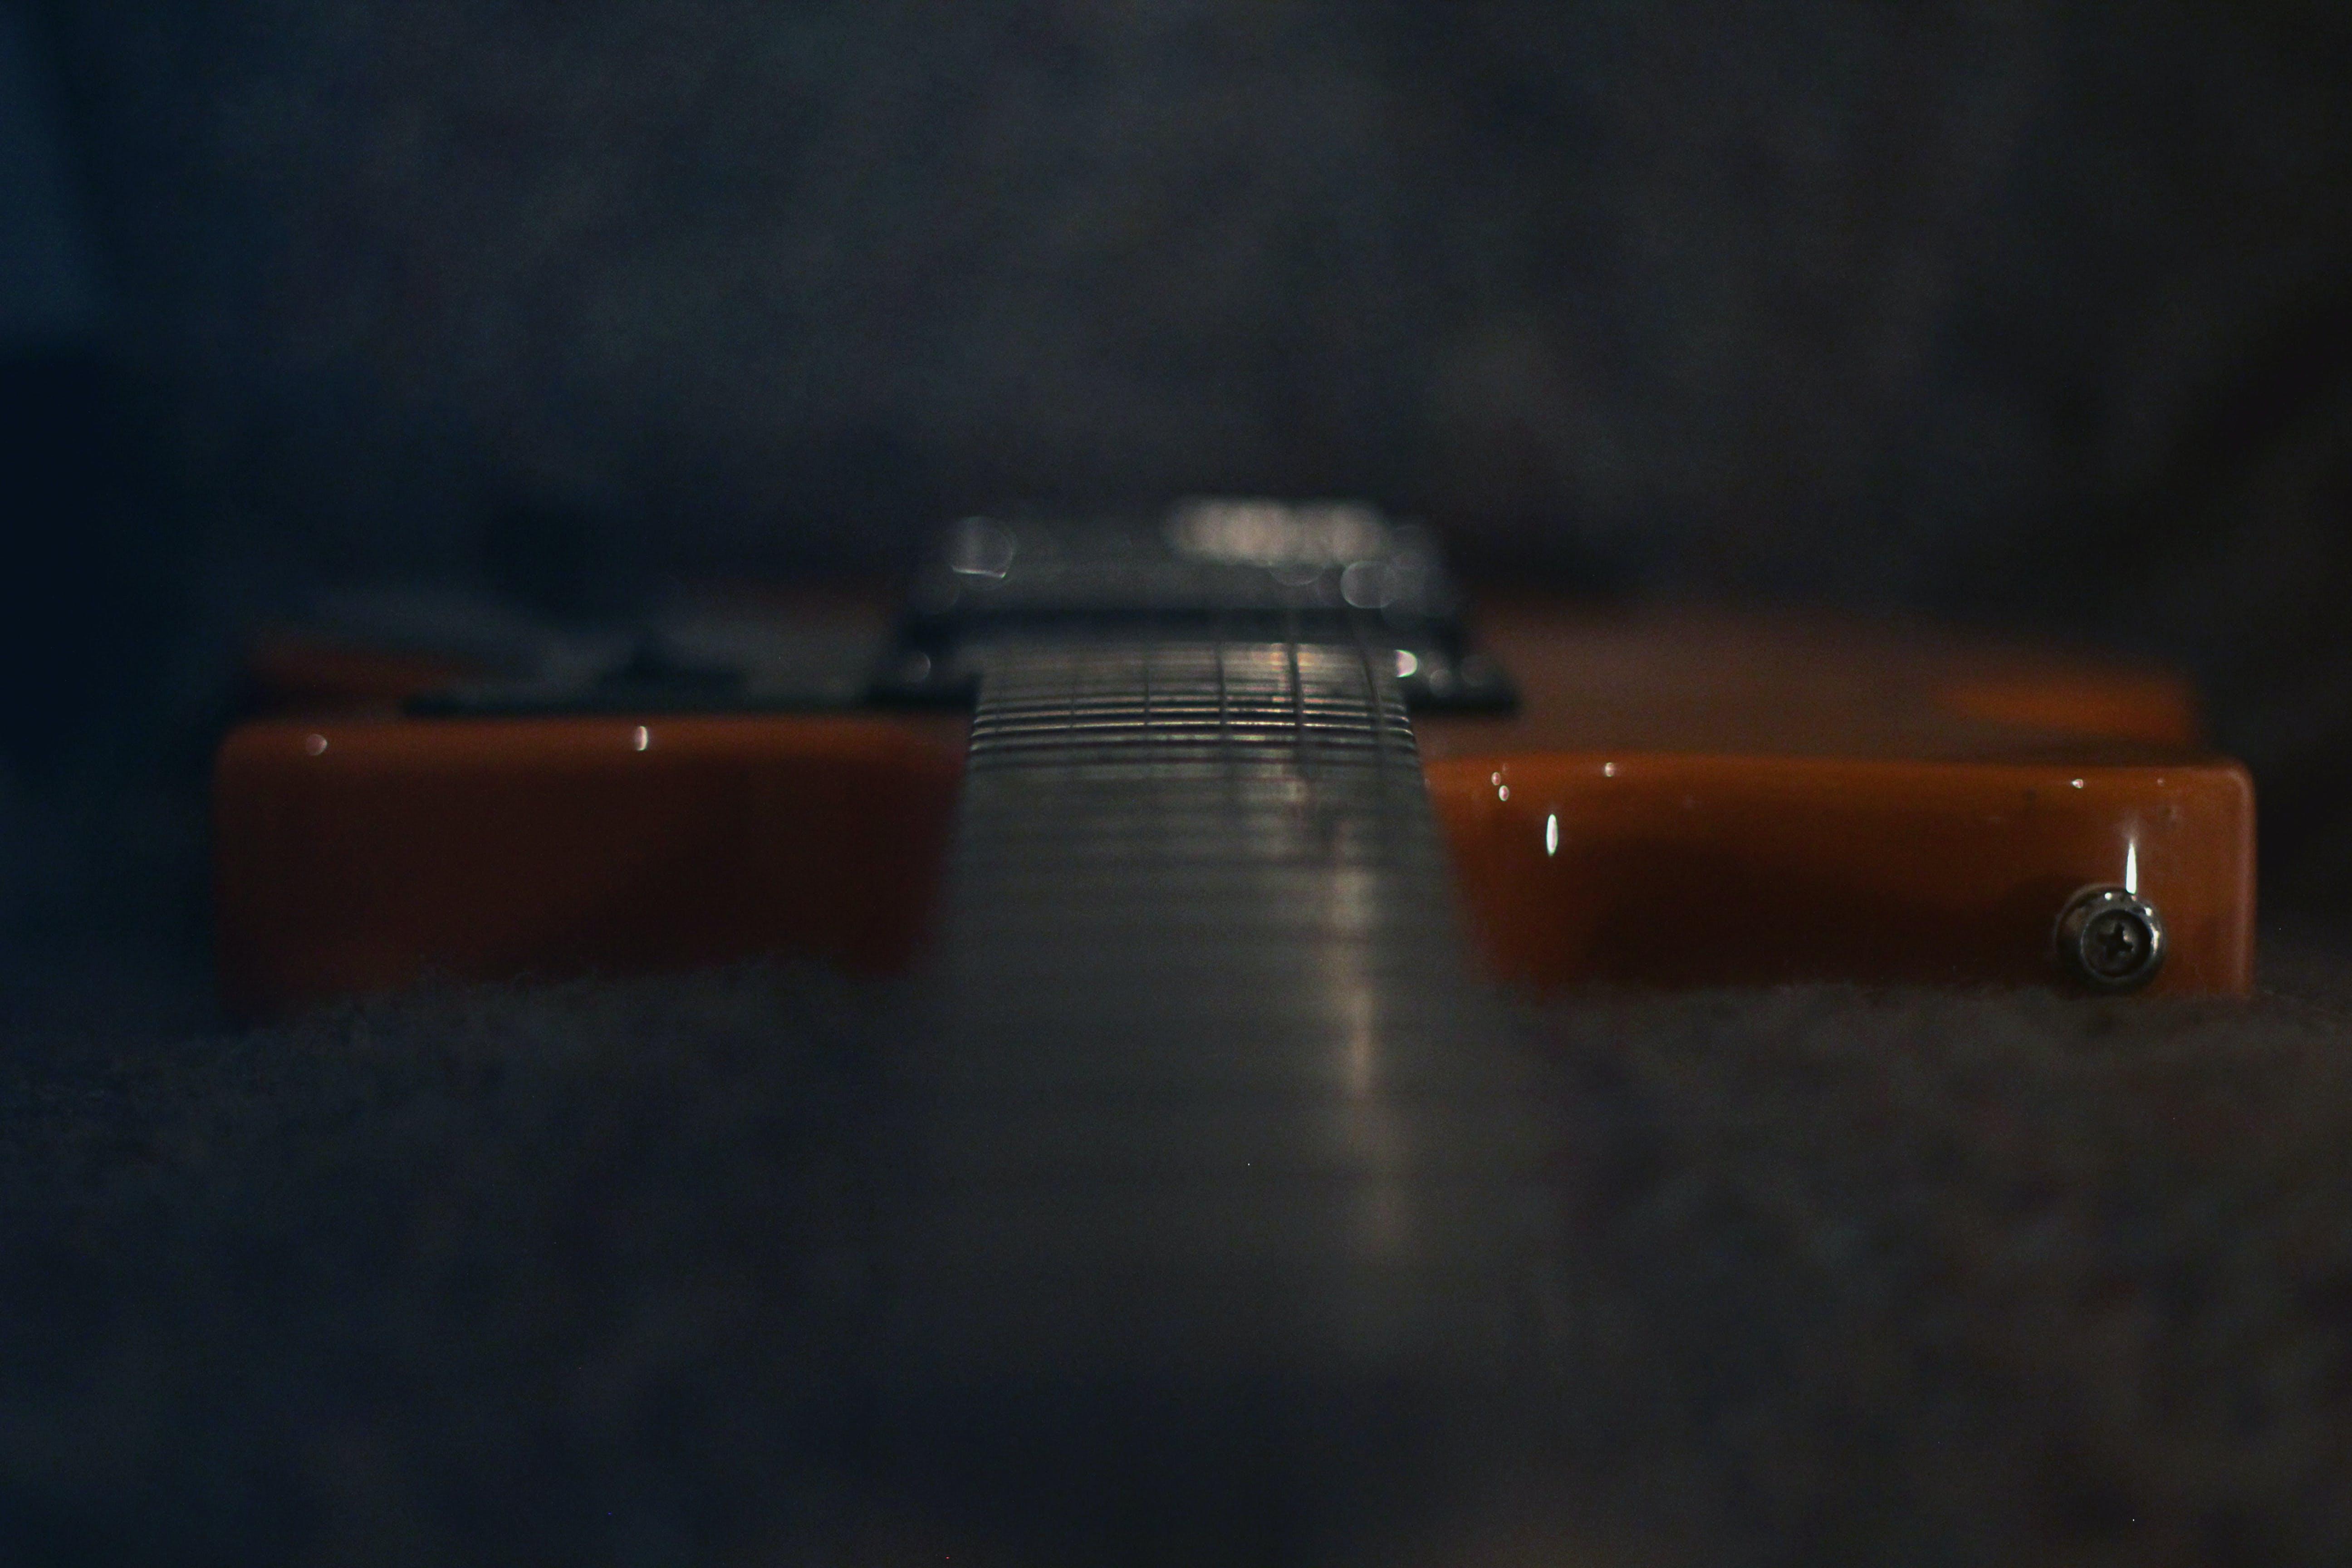 Free stock photo of night, guitar, ibanez